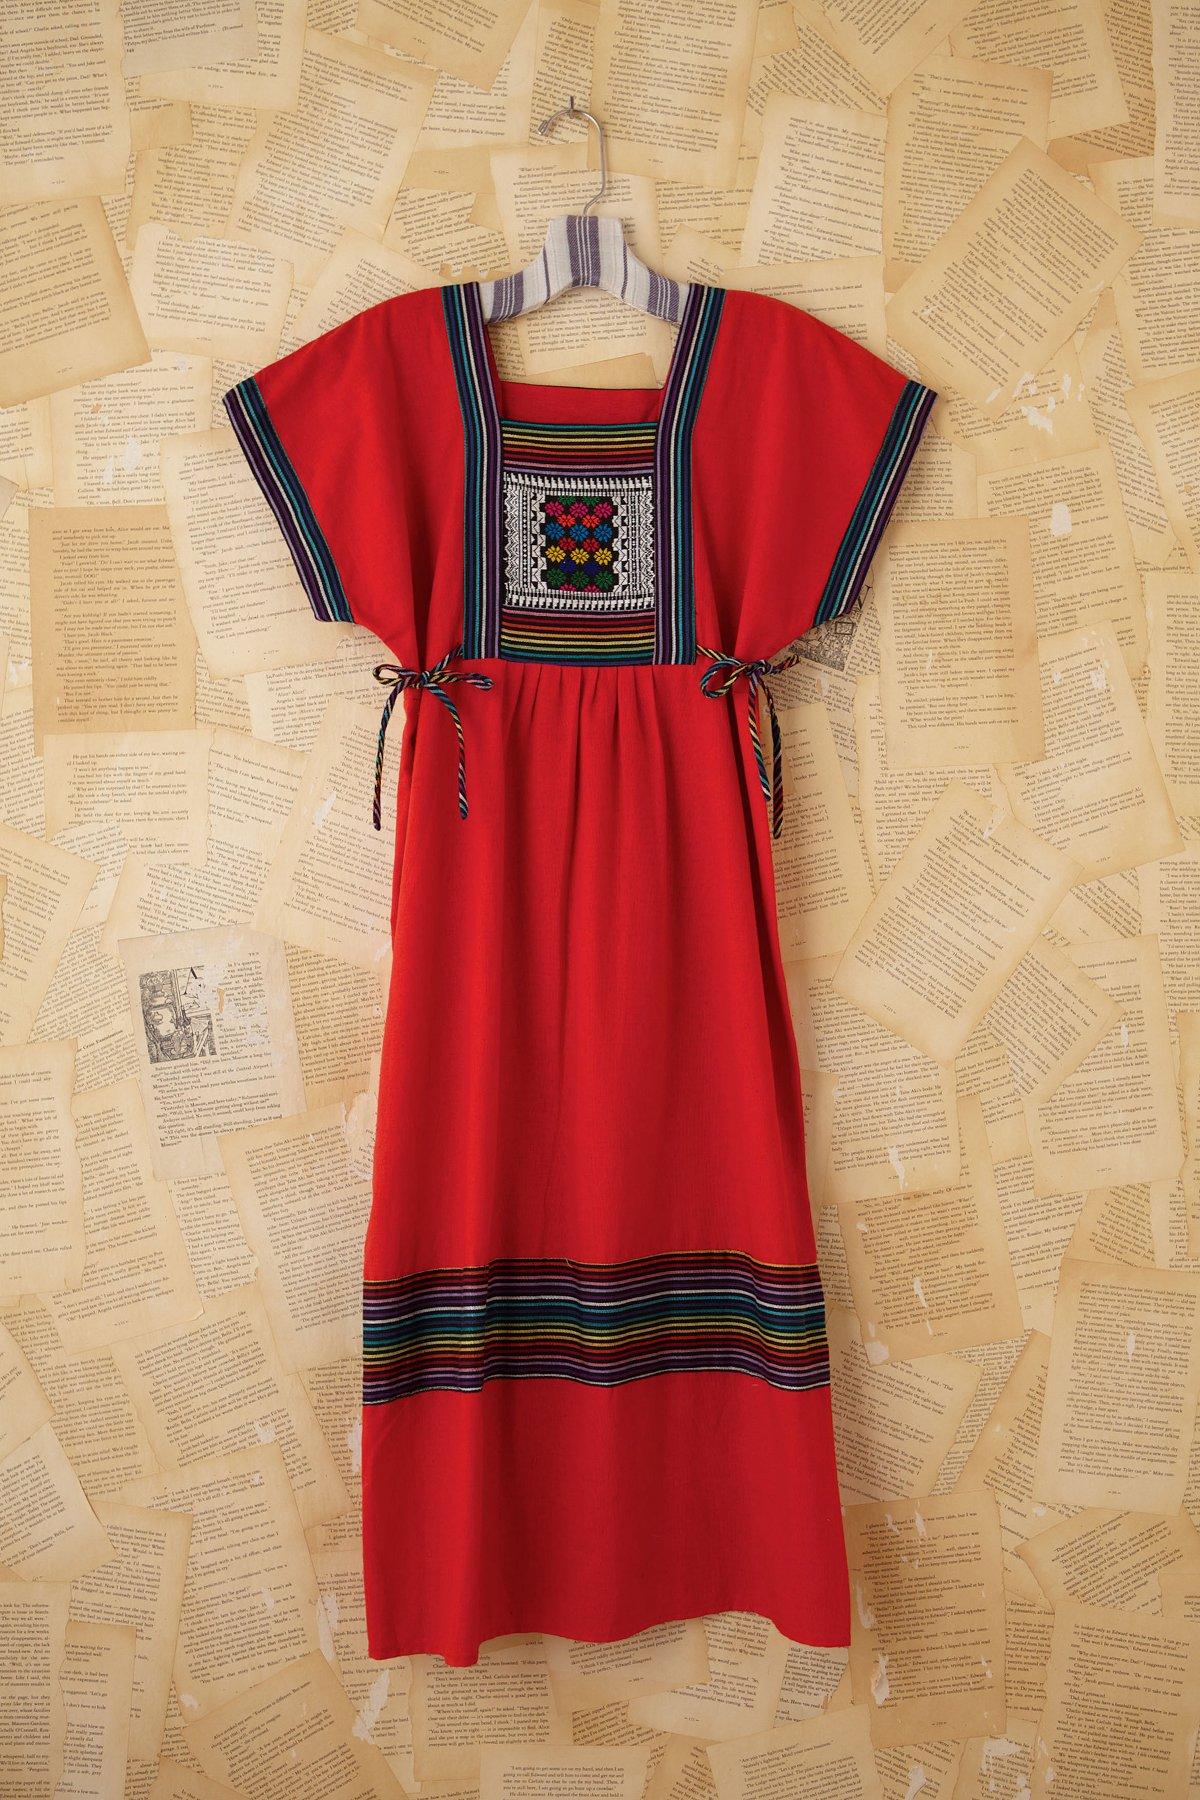 Vintage Red Embroidered Dress